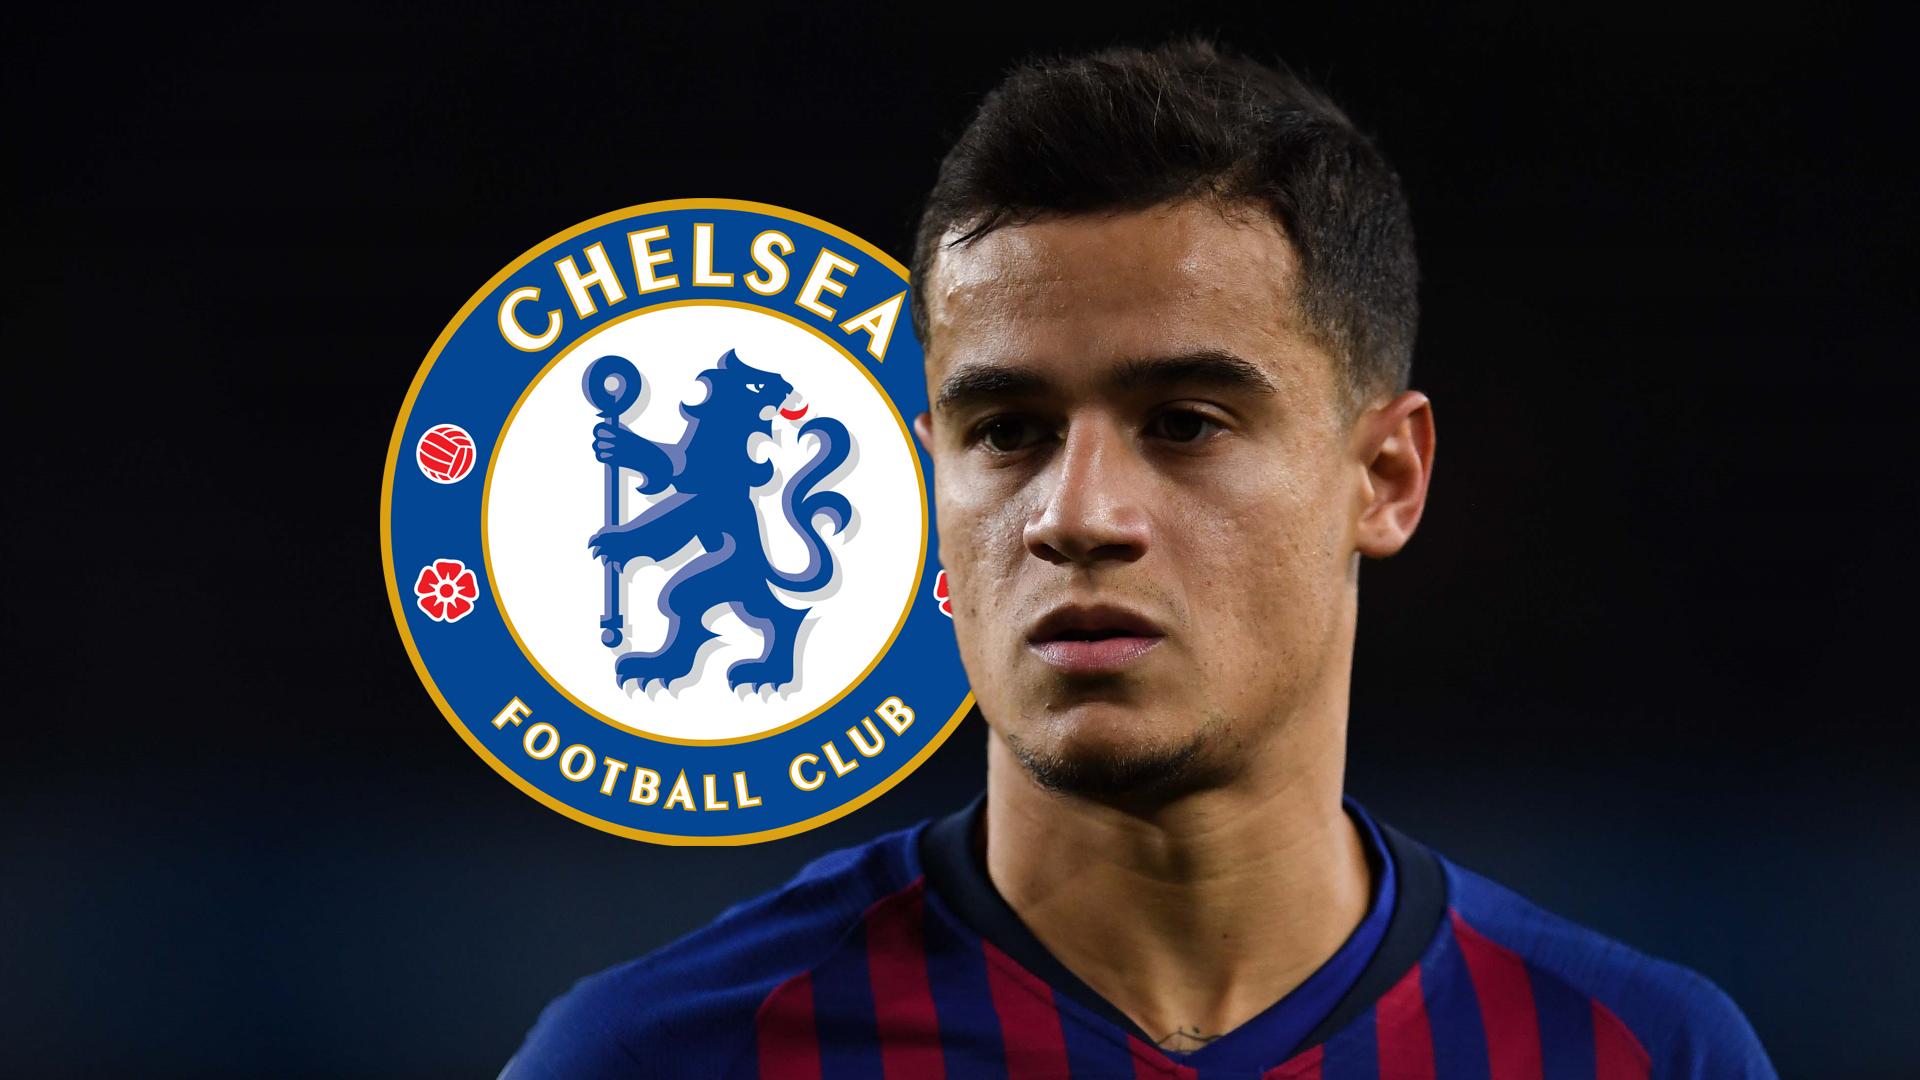 Chelsea News: January Transfer Window News & Rumours LIVE: Chelsea